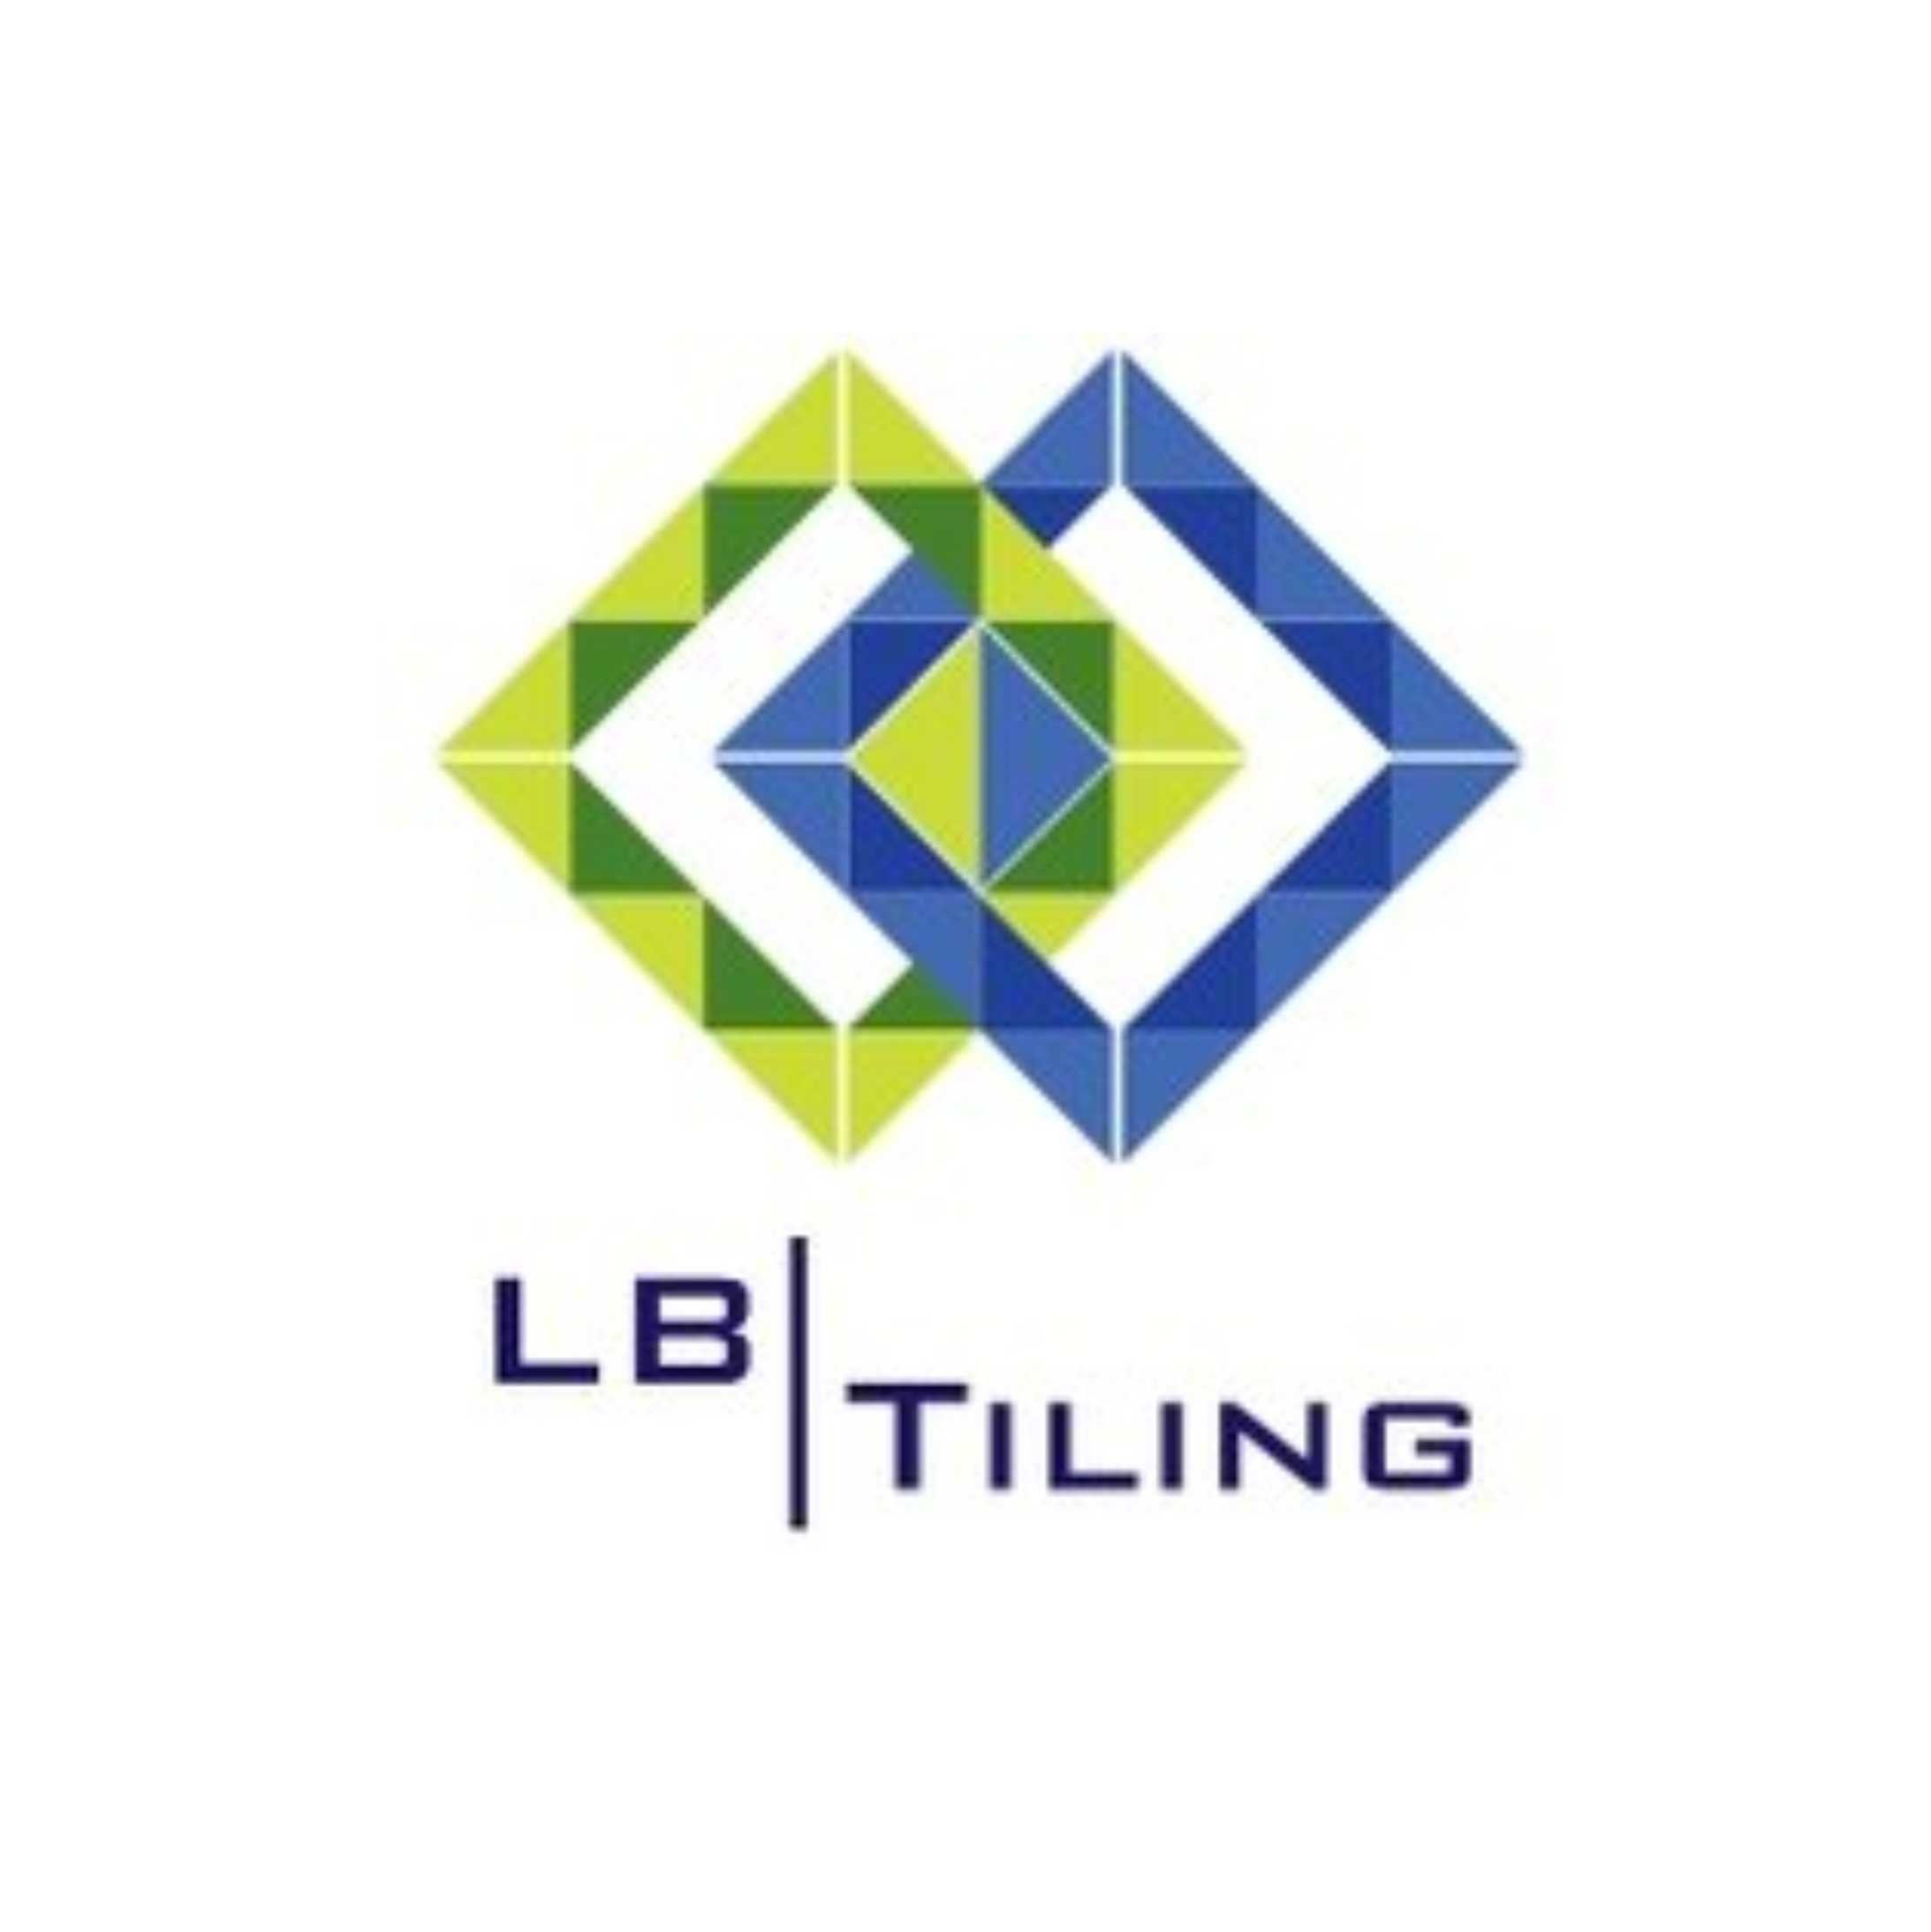 Lukas Bernal- LB Tiling